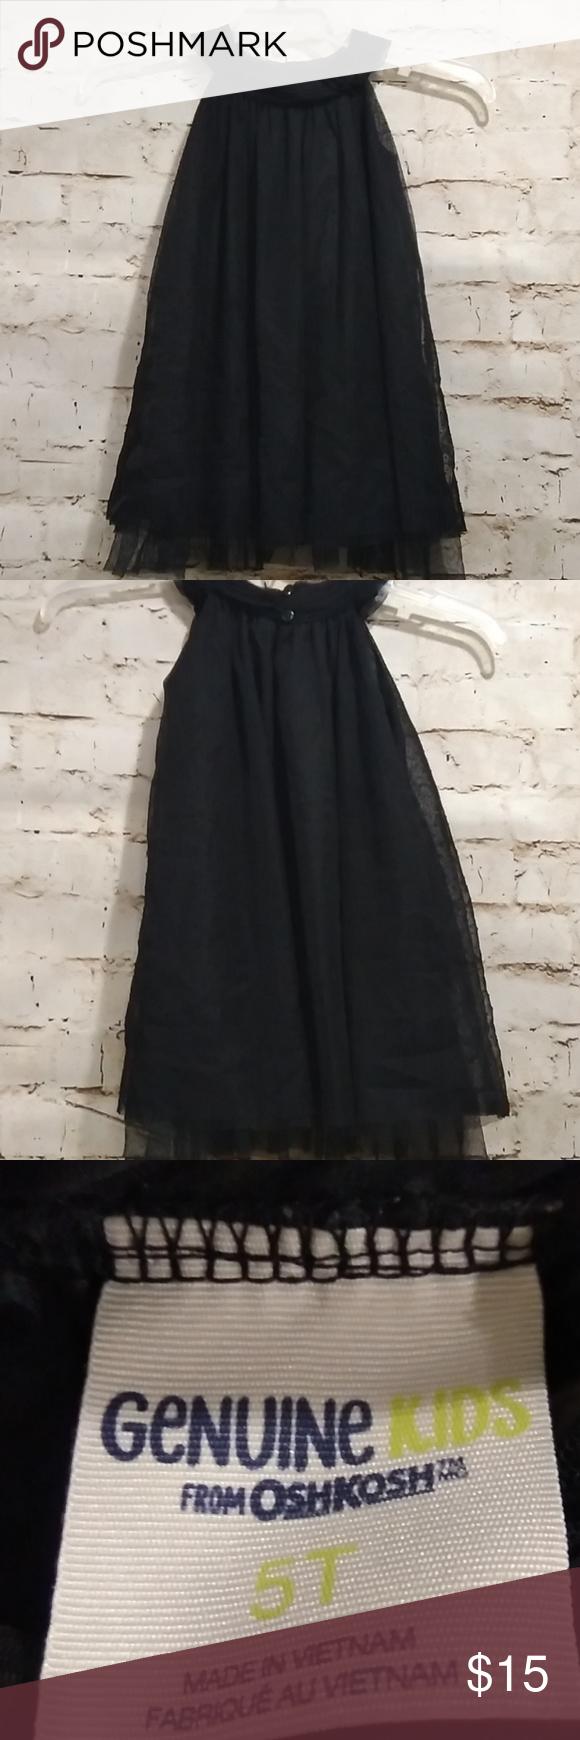 Genuine Kids 5t Black Tulle Holiday Dress Holiday Party Dresses Holiday Dresses Dresses [ 1740 x 580 Pixel ]